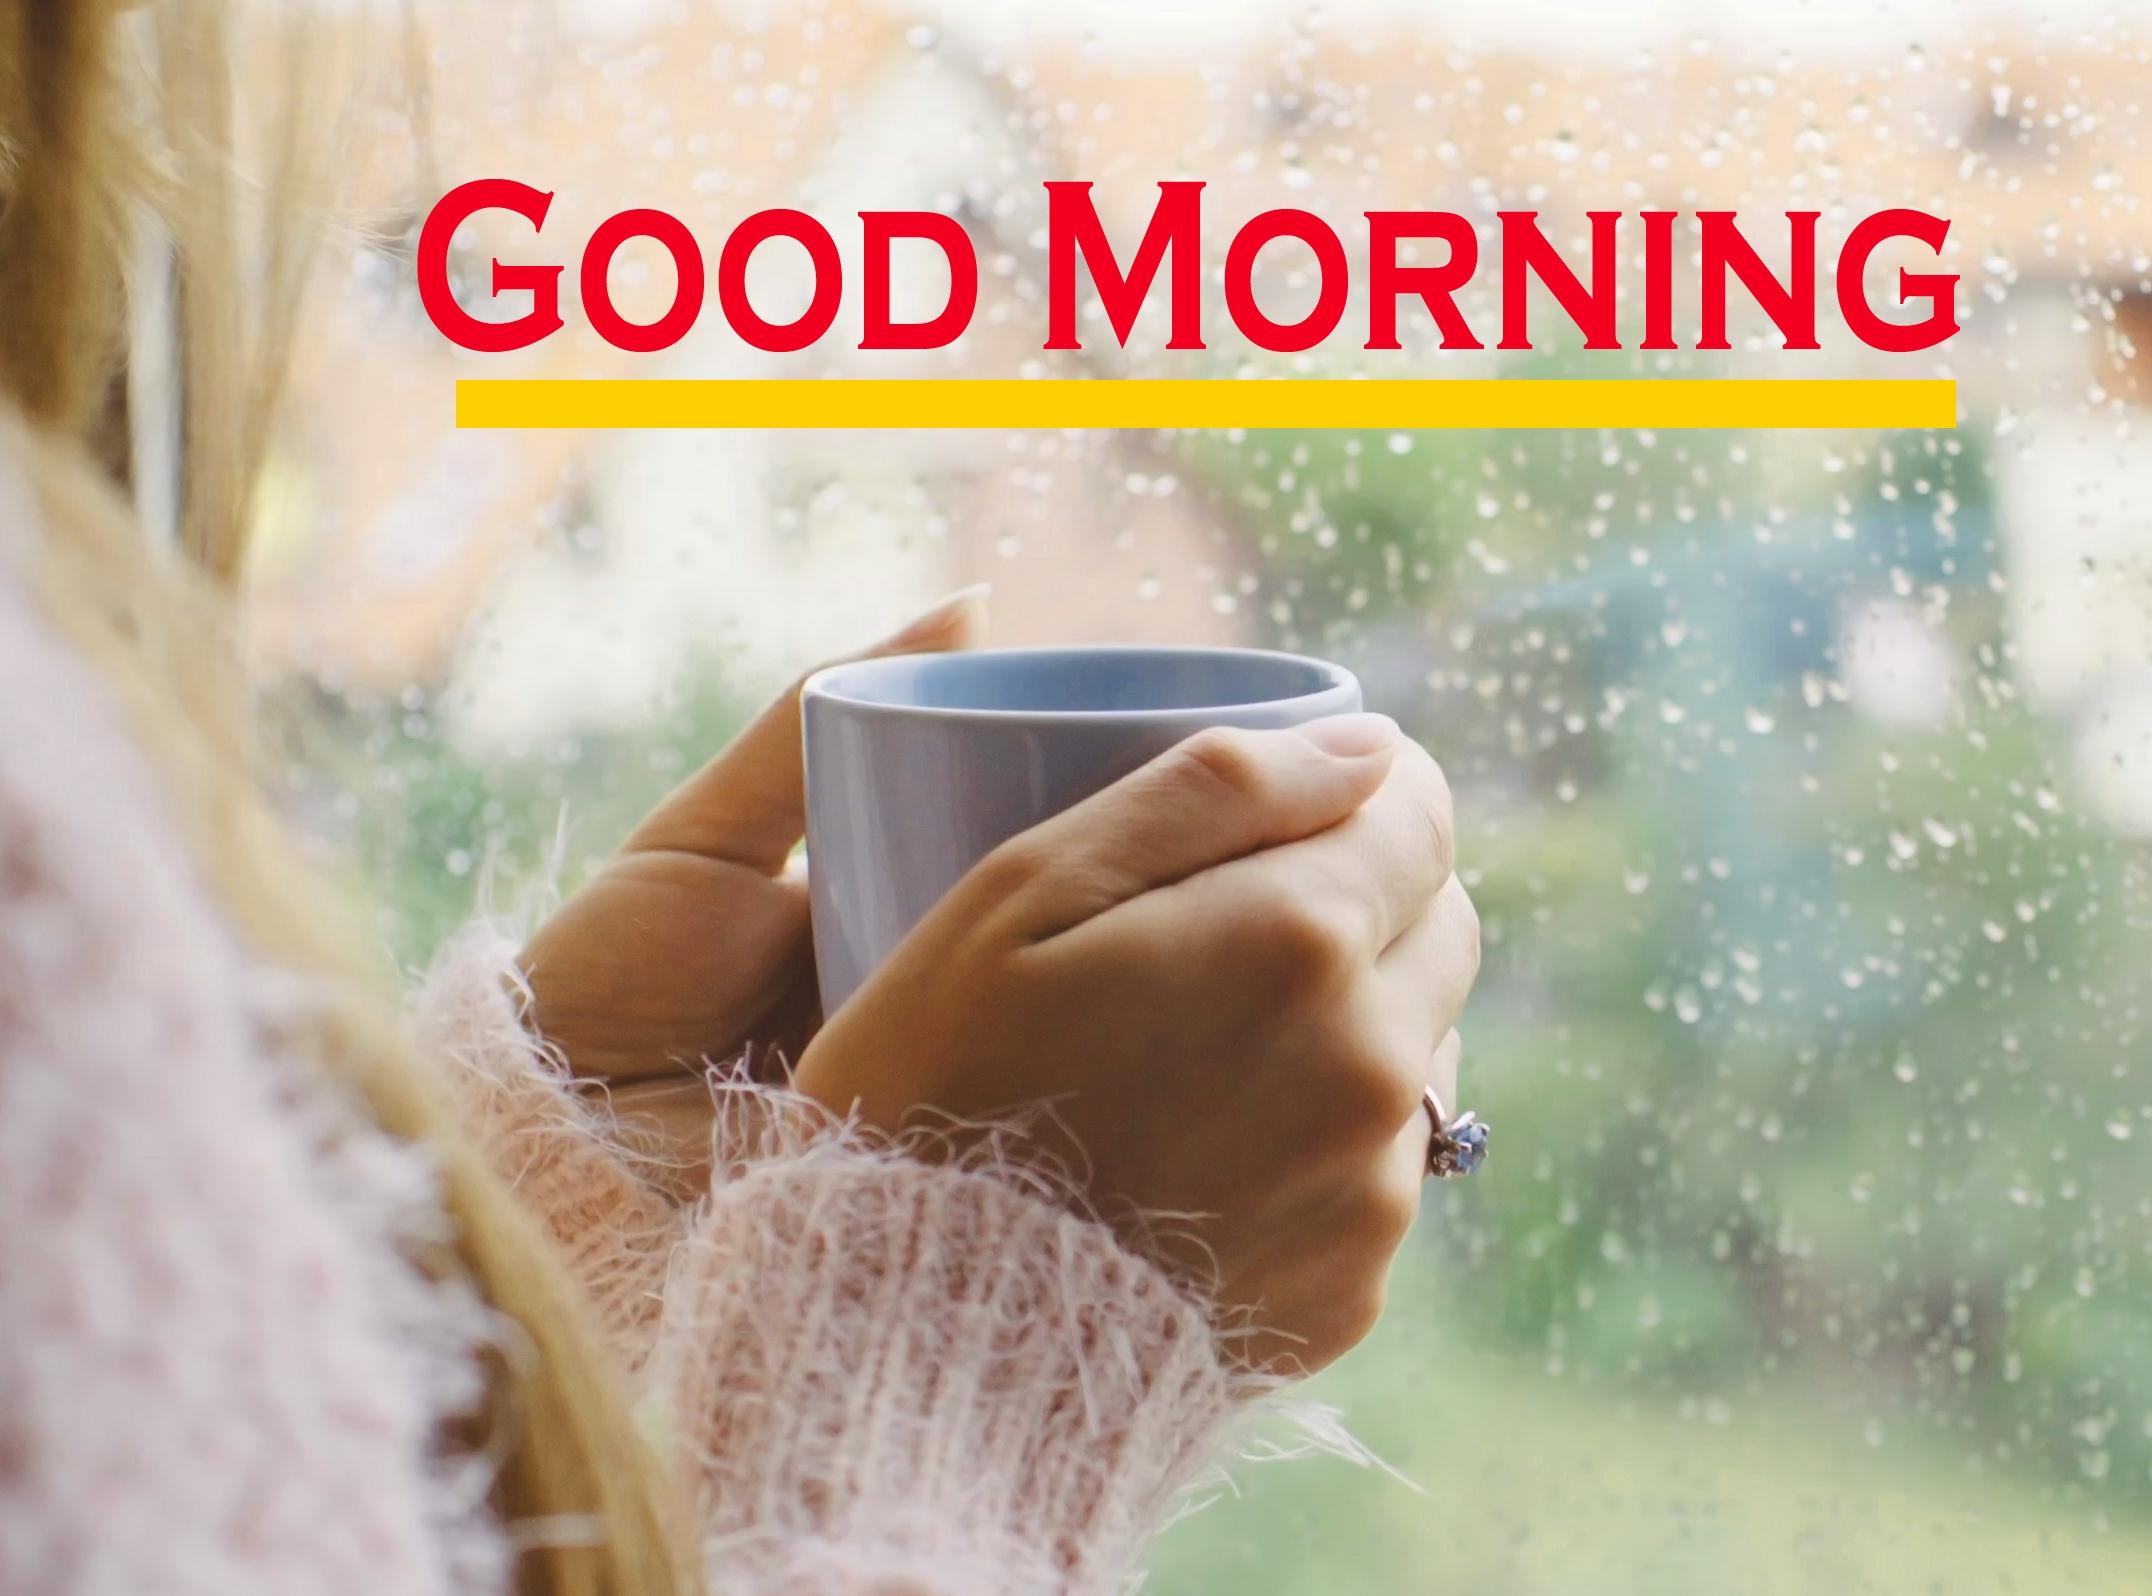 Rainy Day Good Morning Images 5